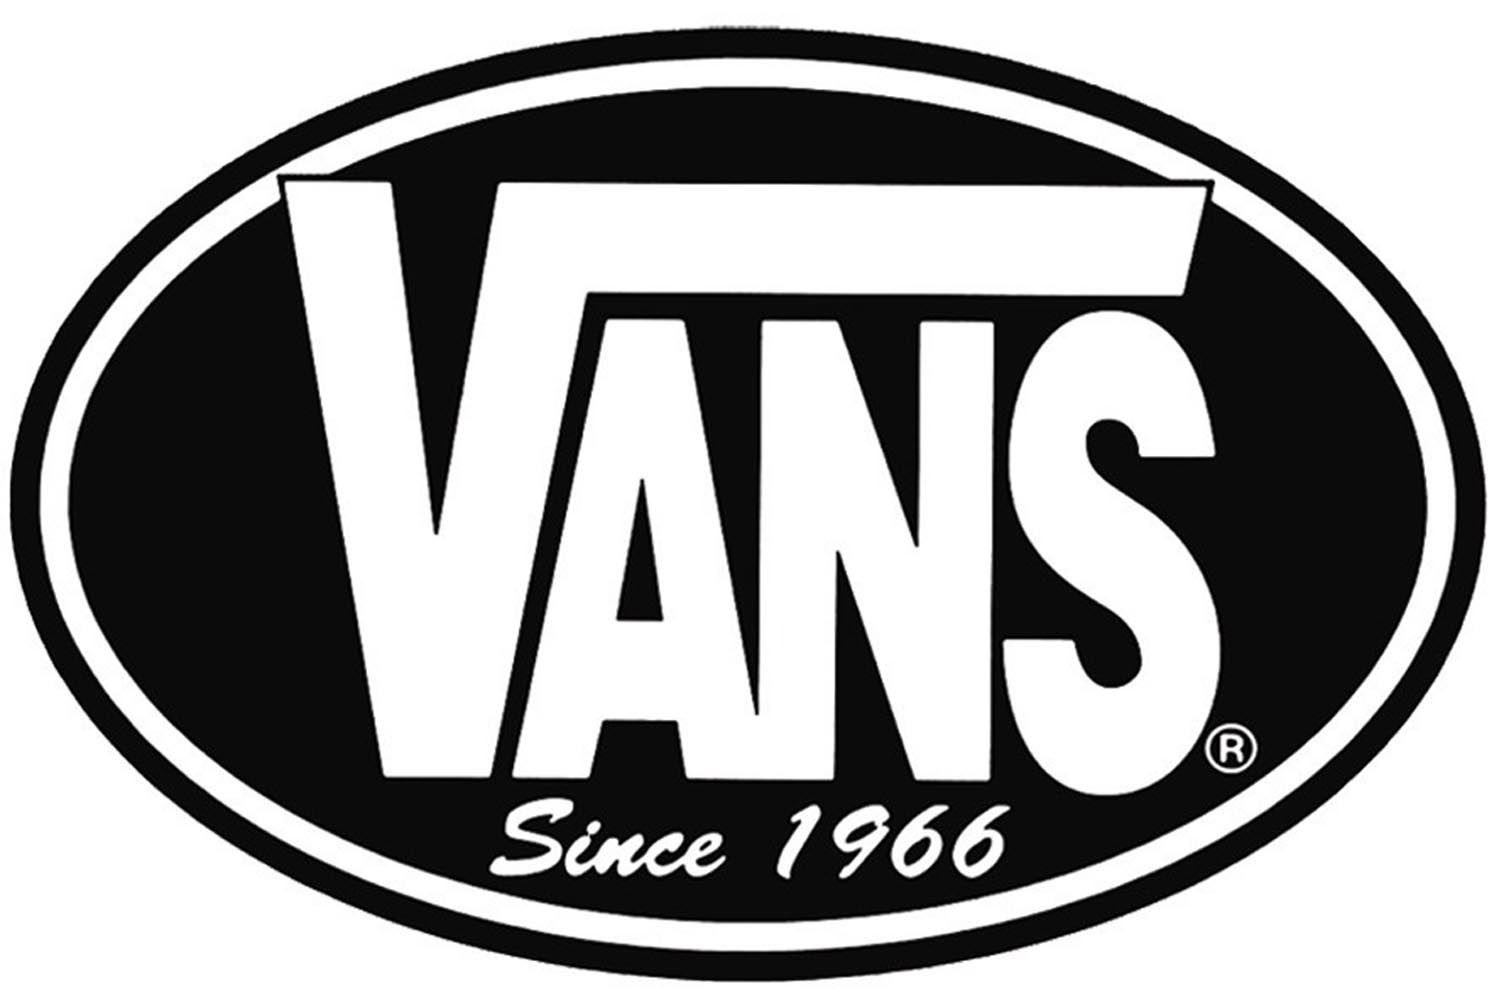 Skateboard Logos Pics Archive | Search, Skateboard and Vans logo